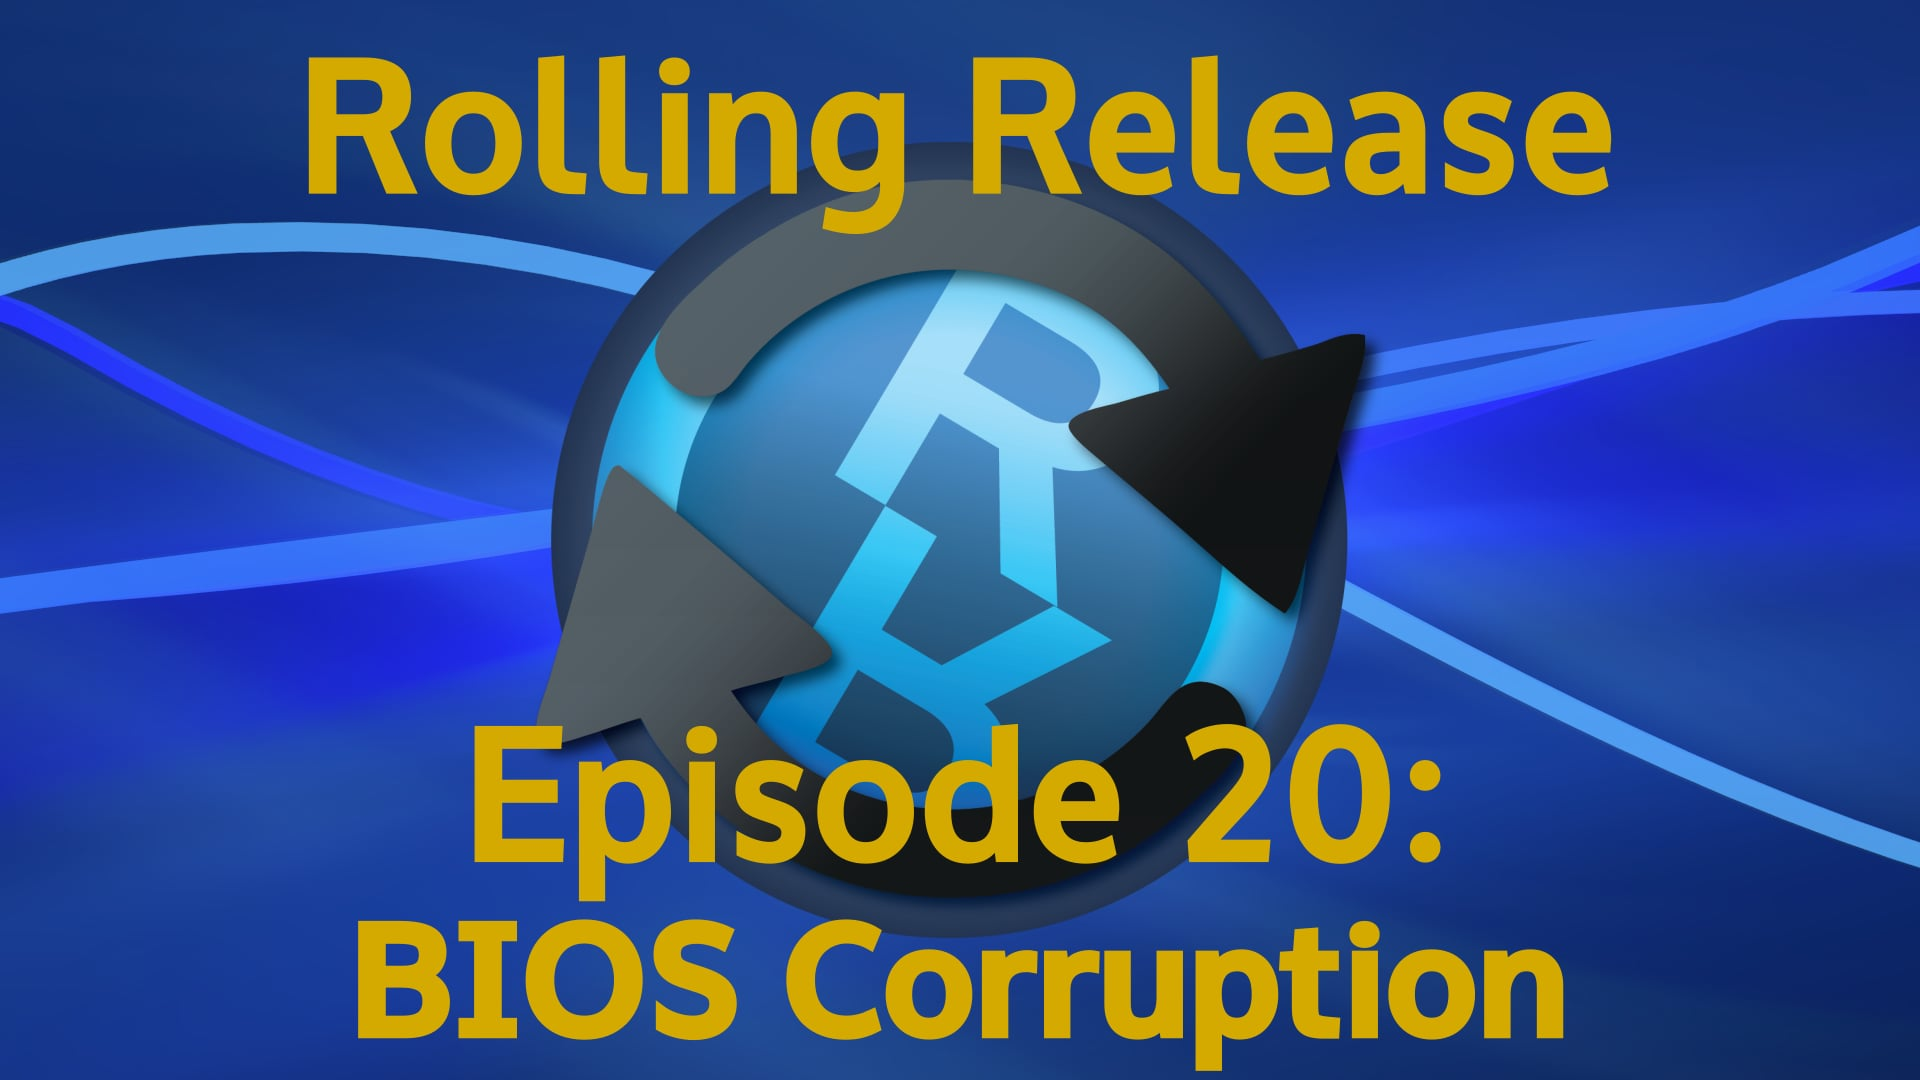 BIOS Corruption - Rolling Release #20